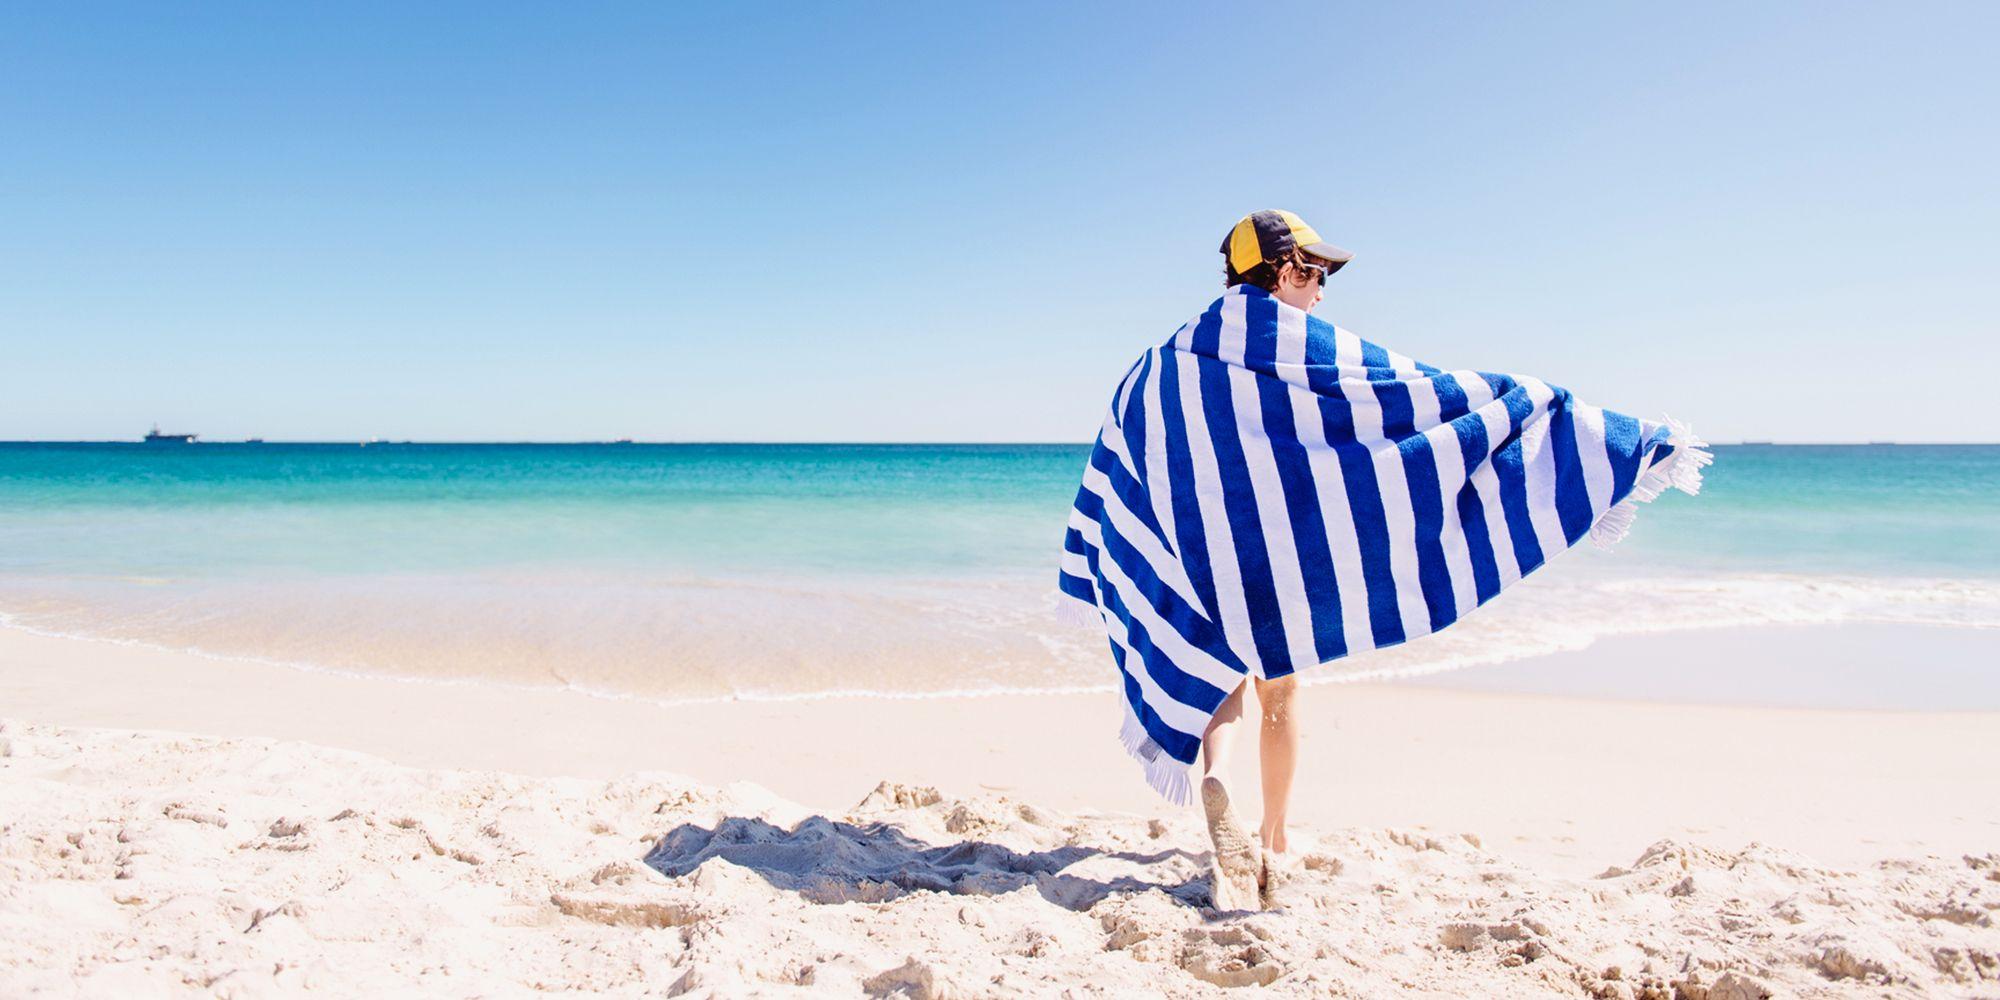 7 Best Kids Beach Towels for Summer 2018 Fun Beach Towels for Kids